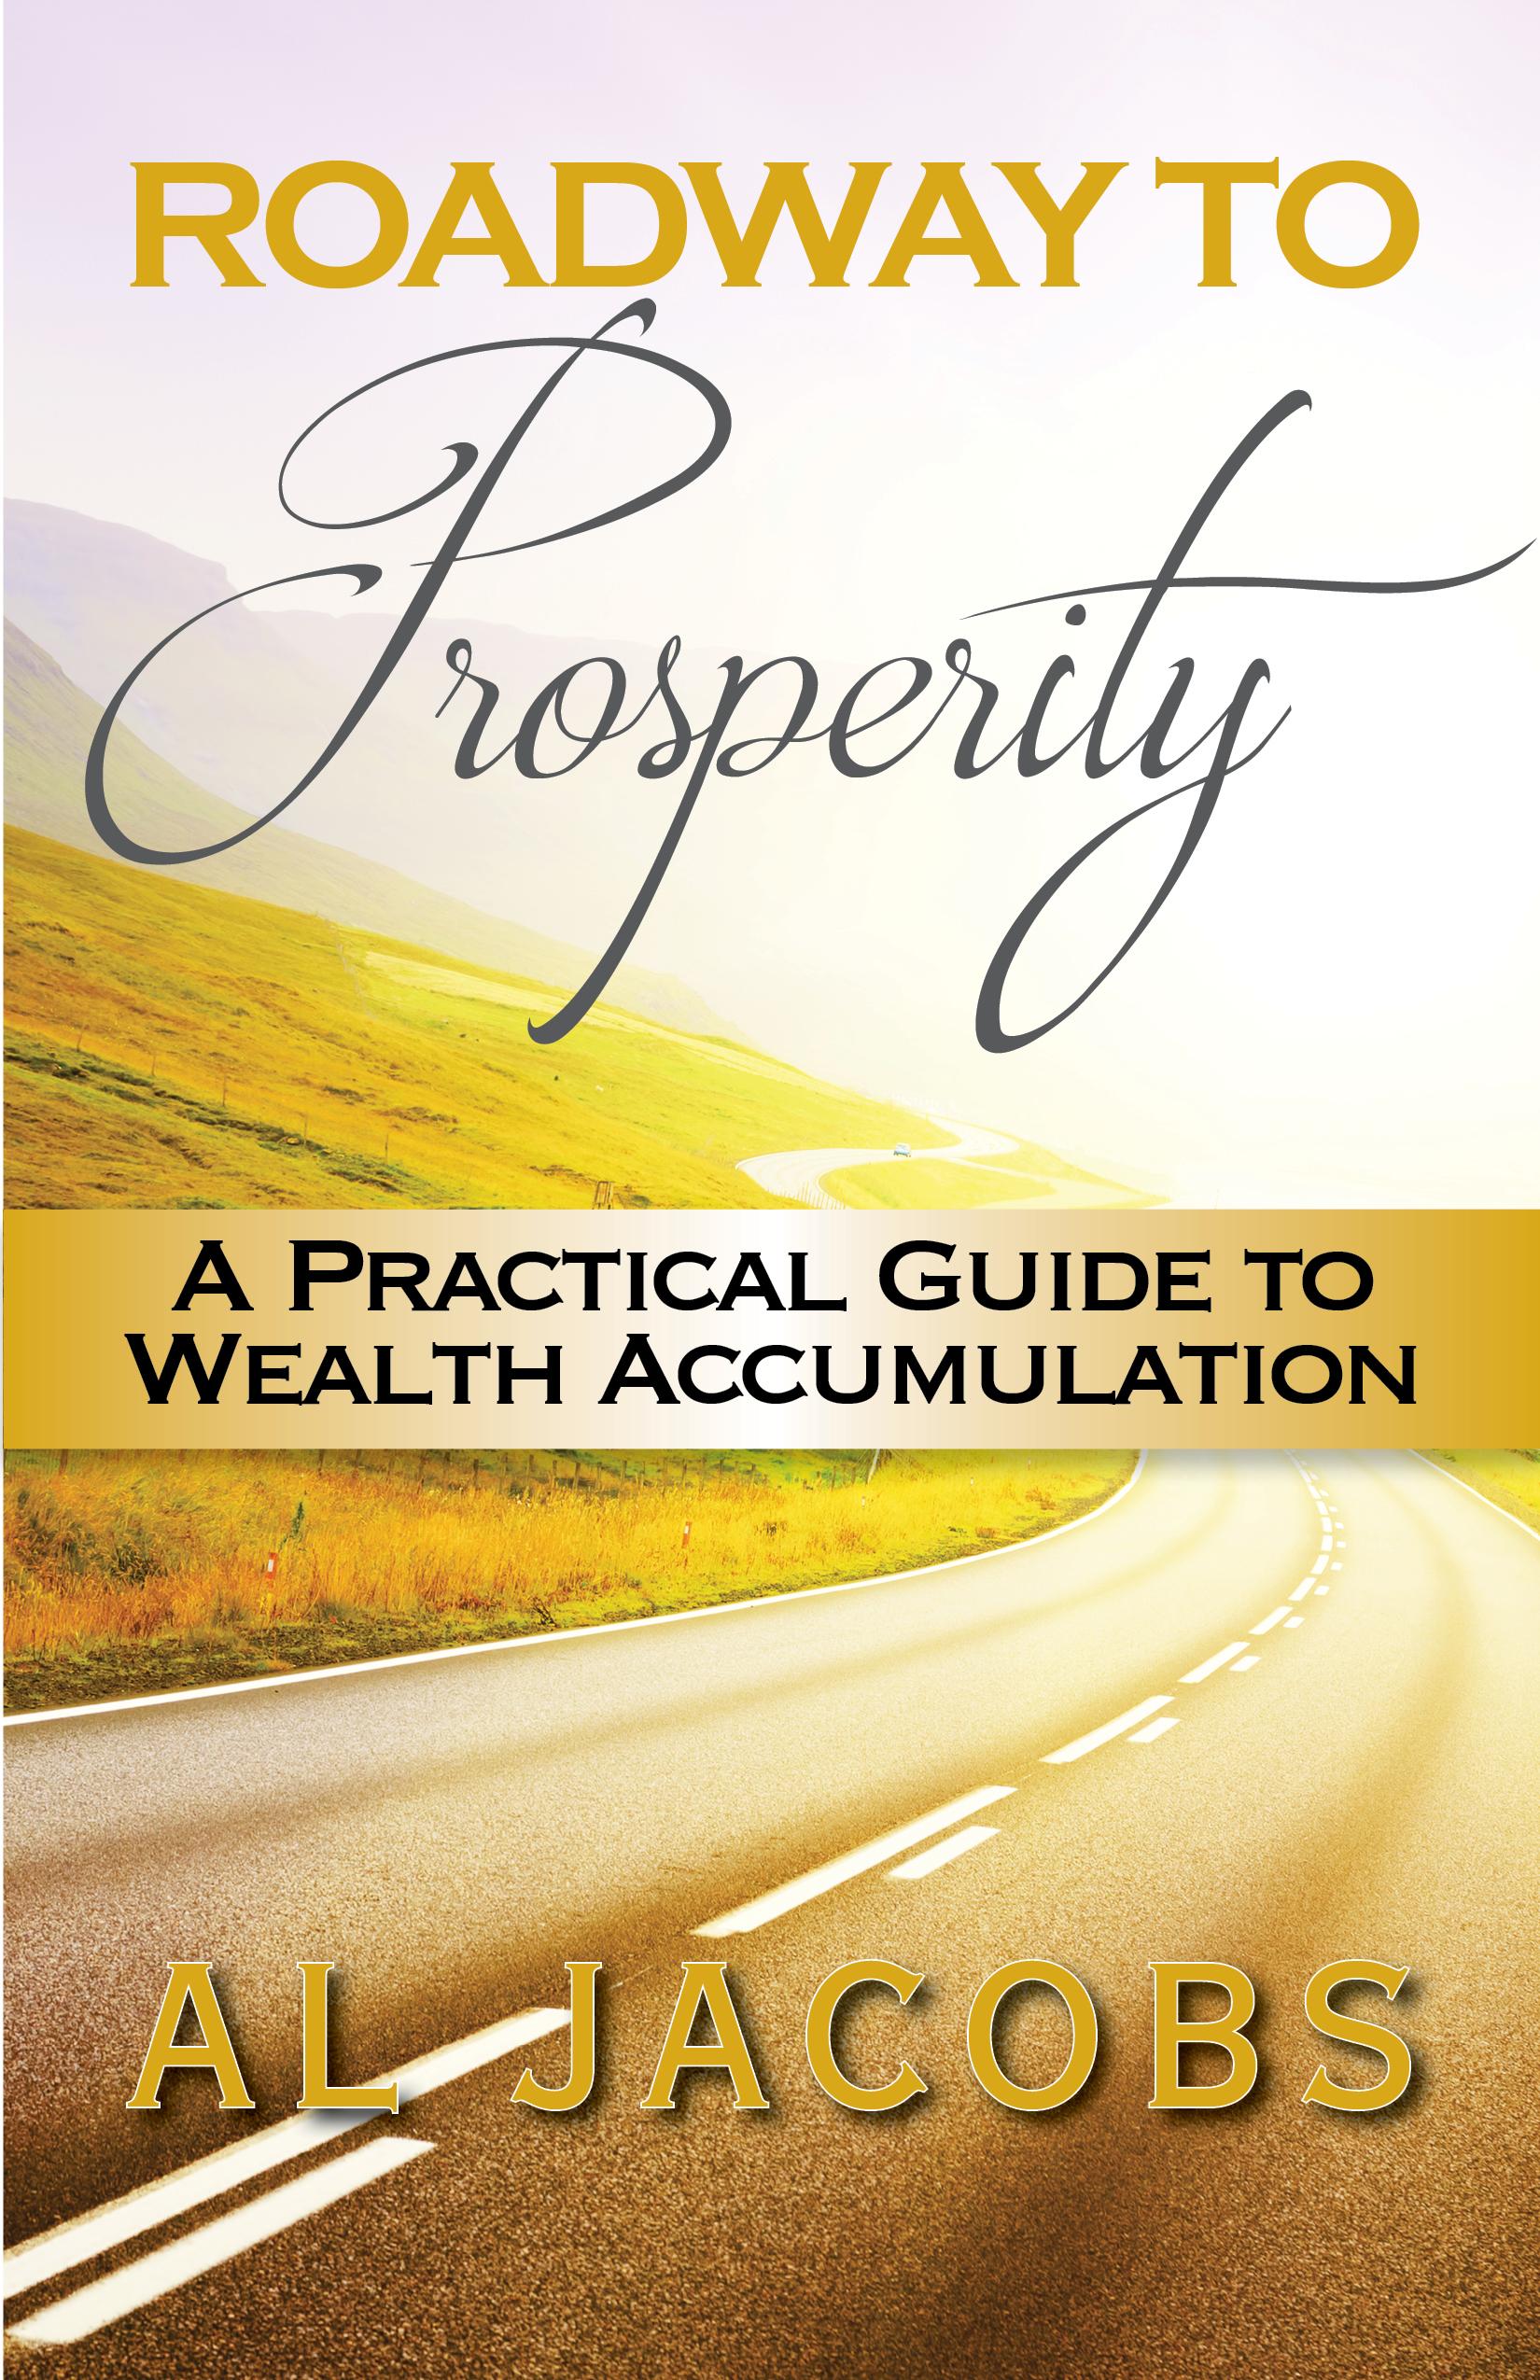 Roadway to Prosperity